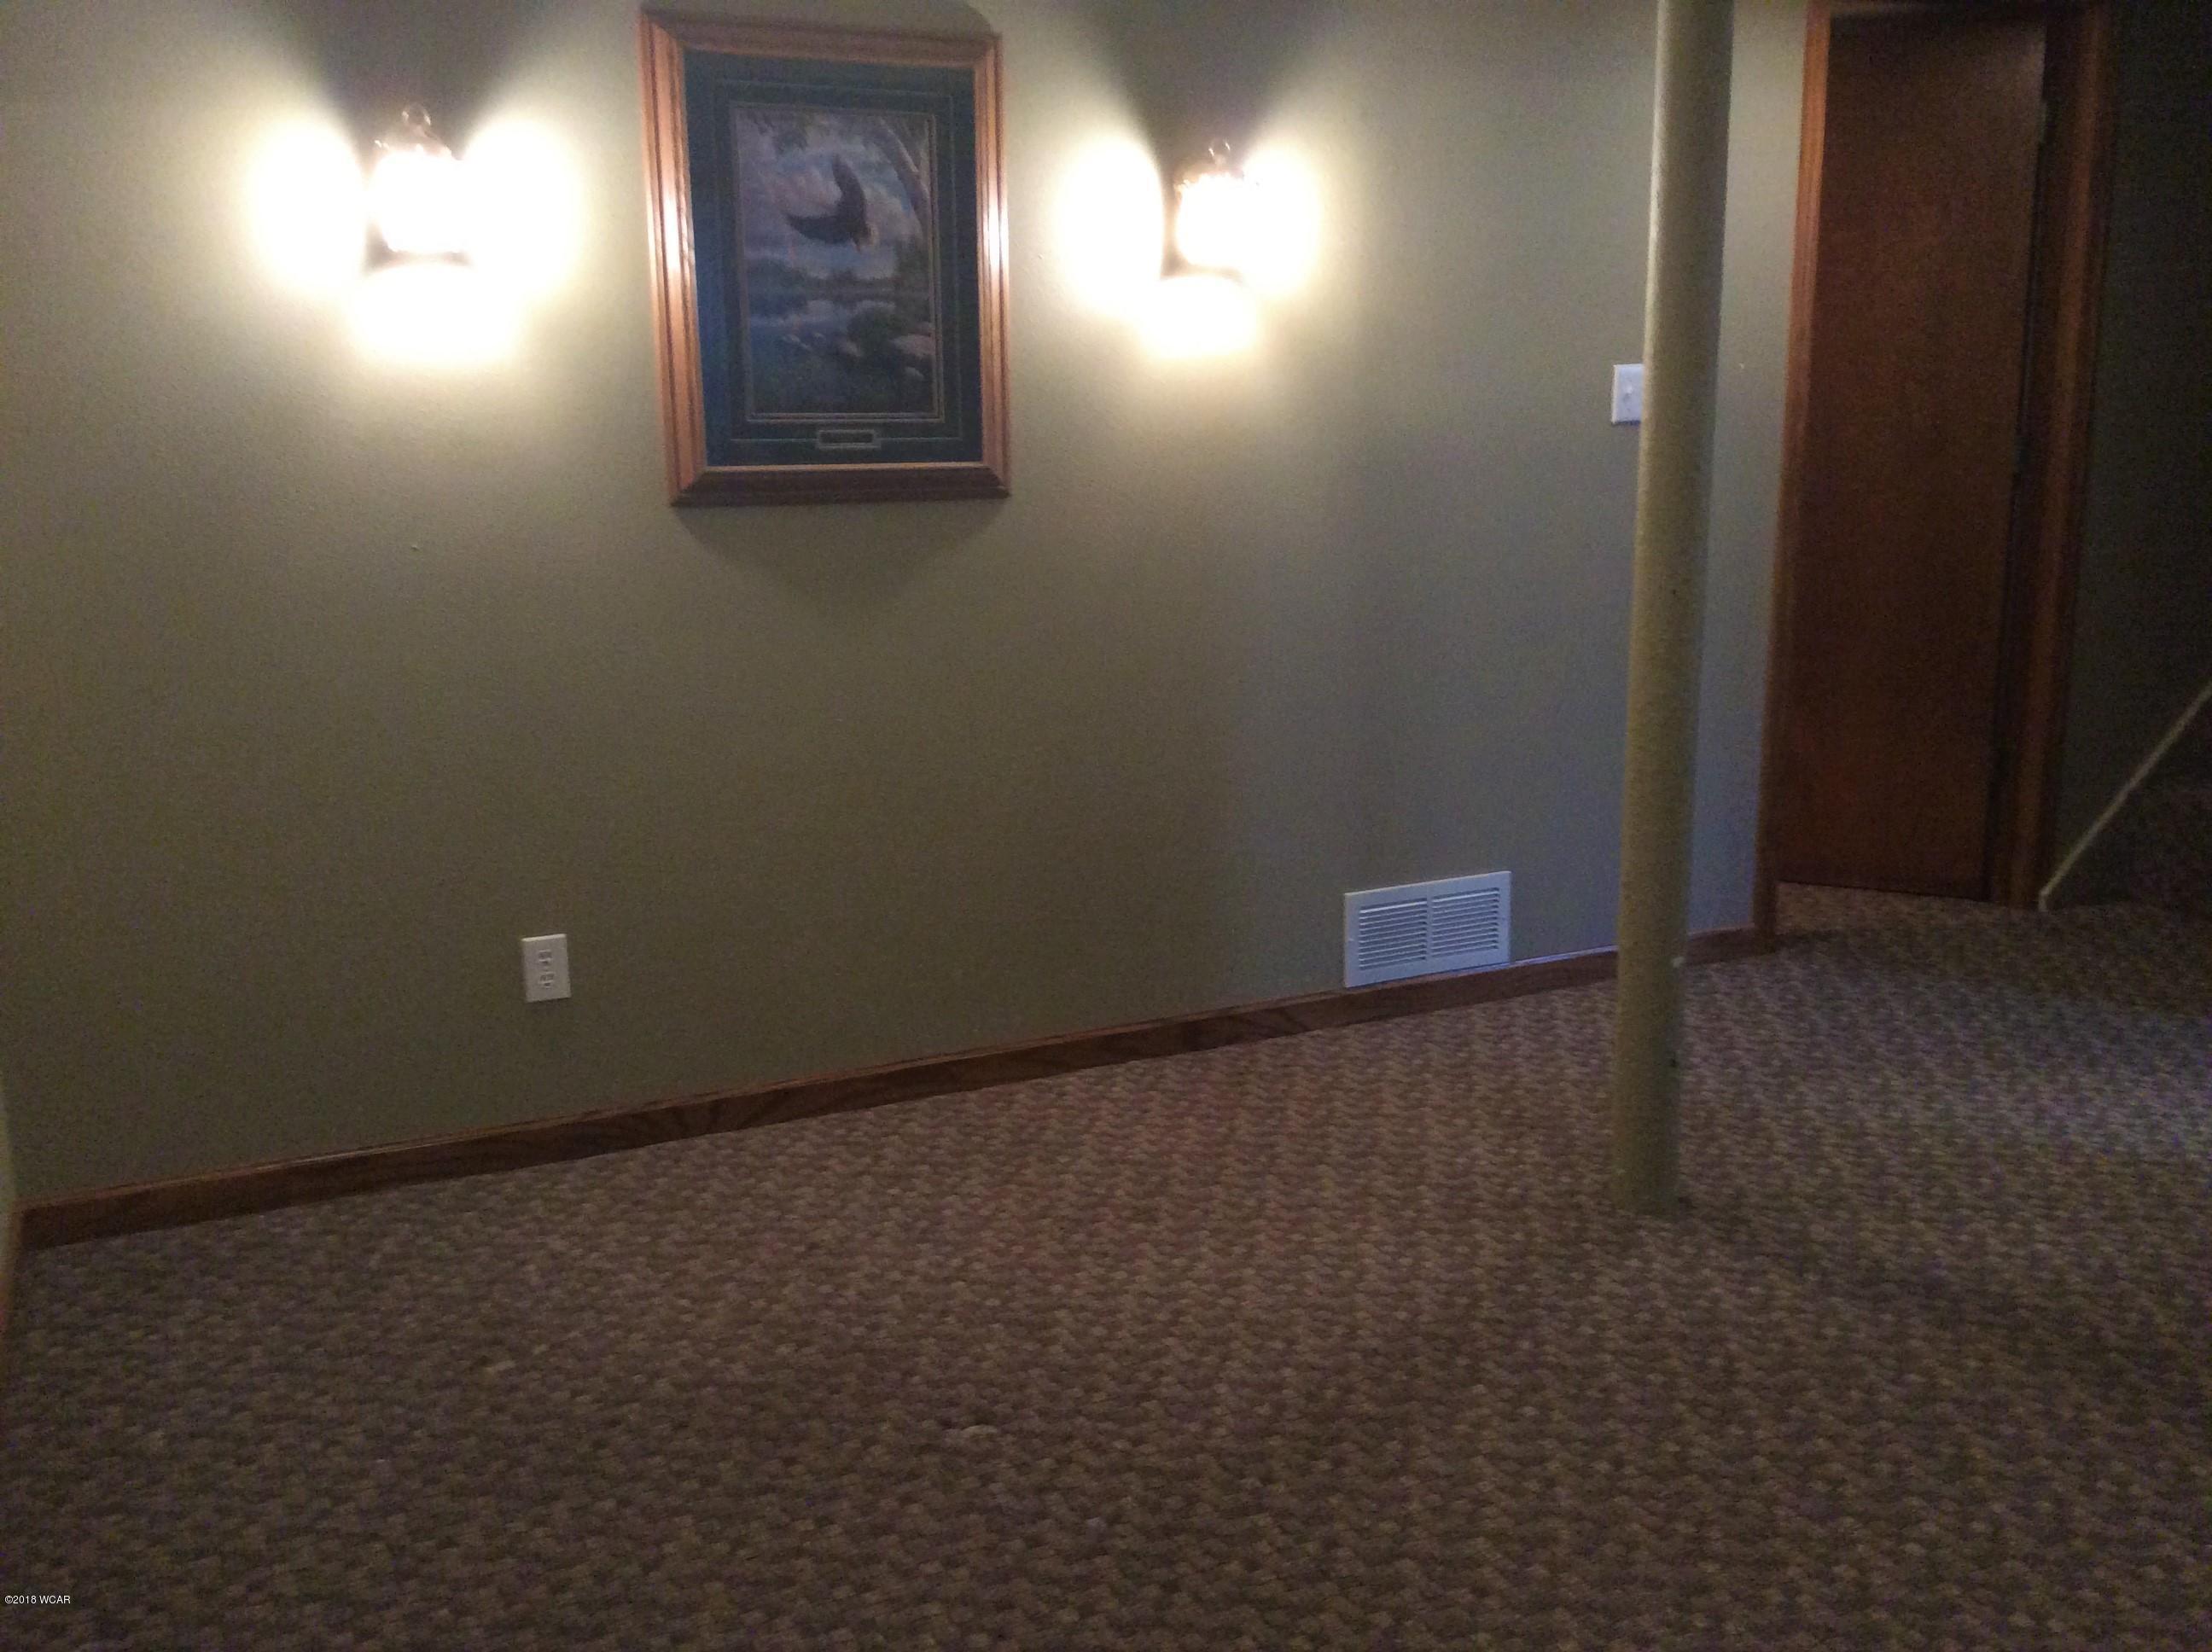 12522 15th Street,Svea,3 Bedrooms Bedrooms,1 BathroomBathrooms,Single Family,15th Street,6032926